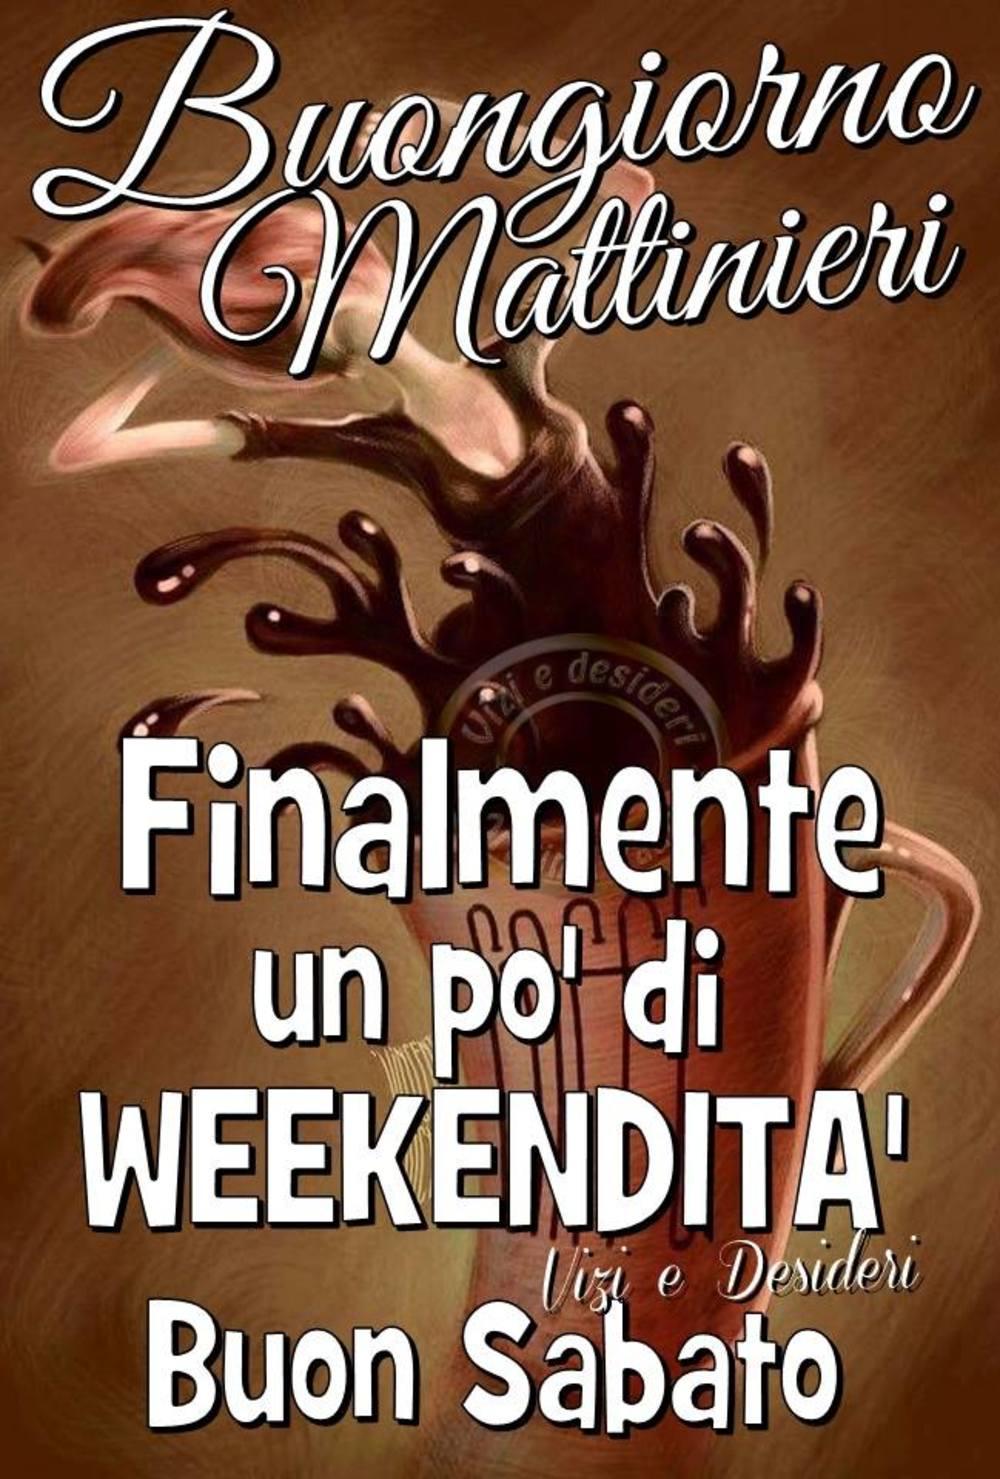 Buon Sabato Mattina Amici Miei 1 Buongiornoateit